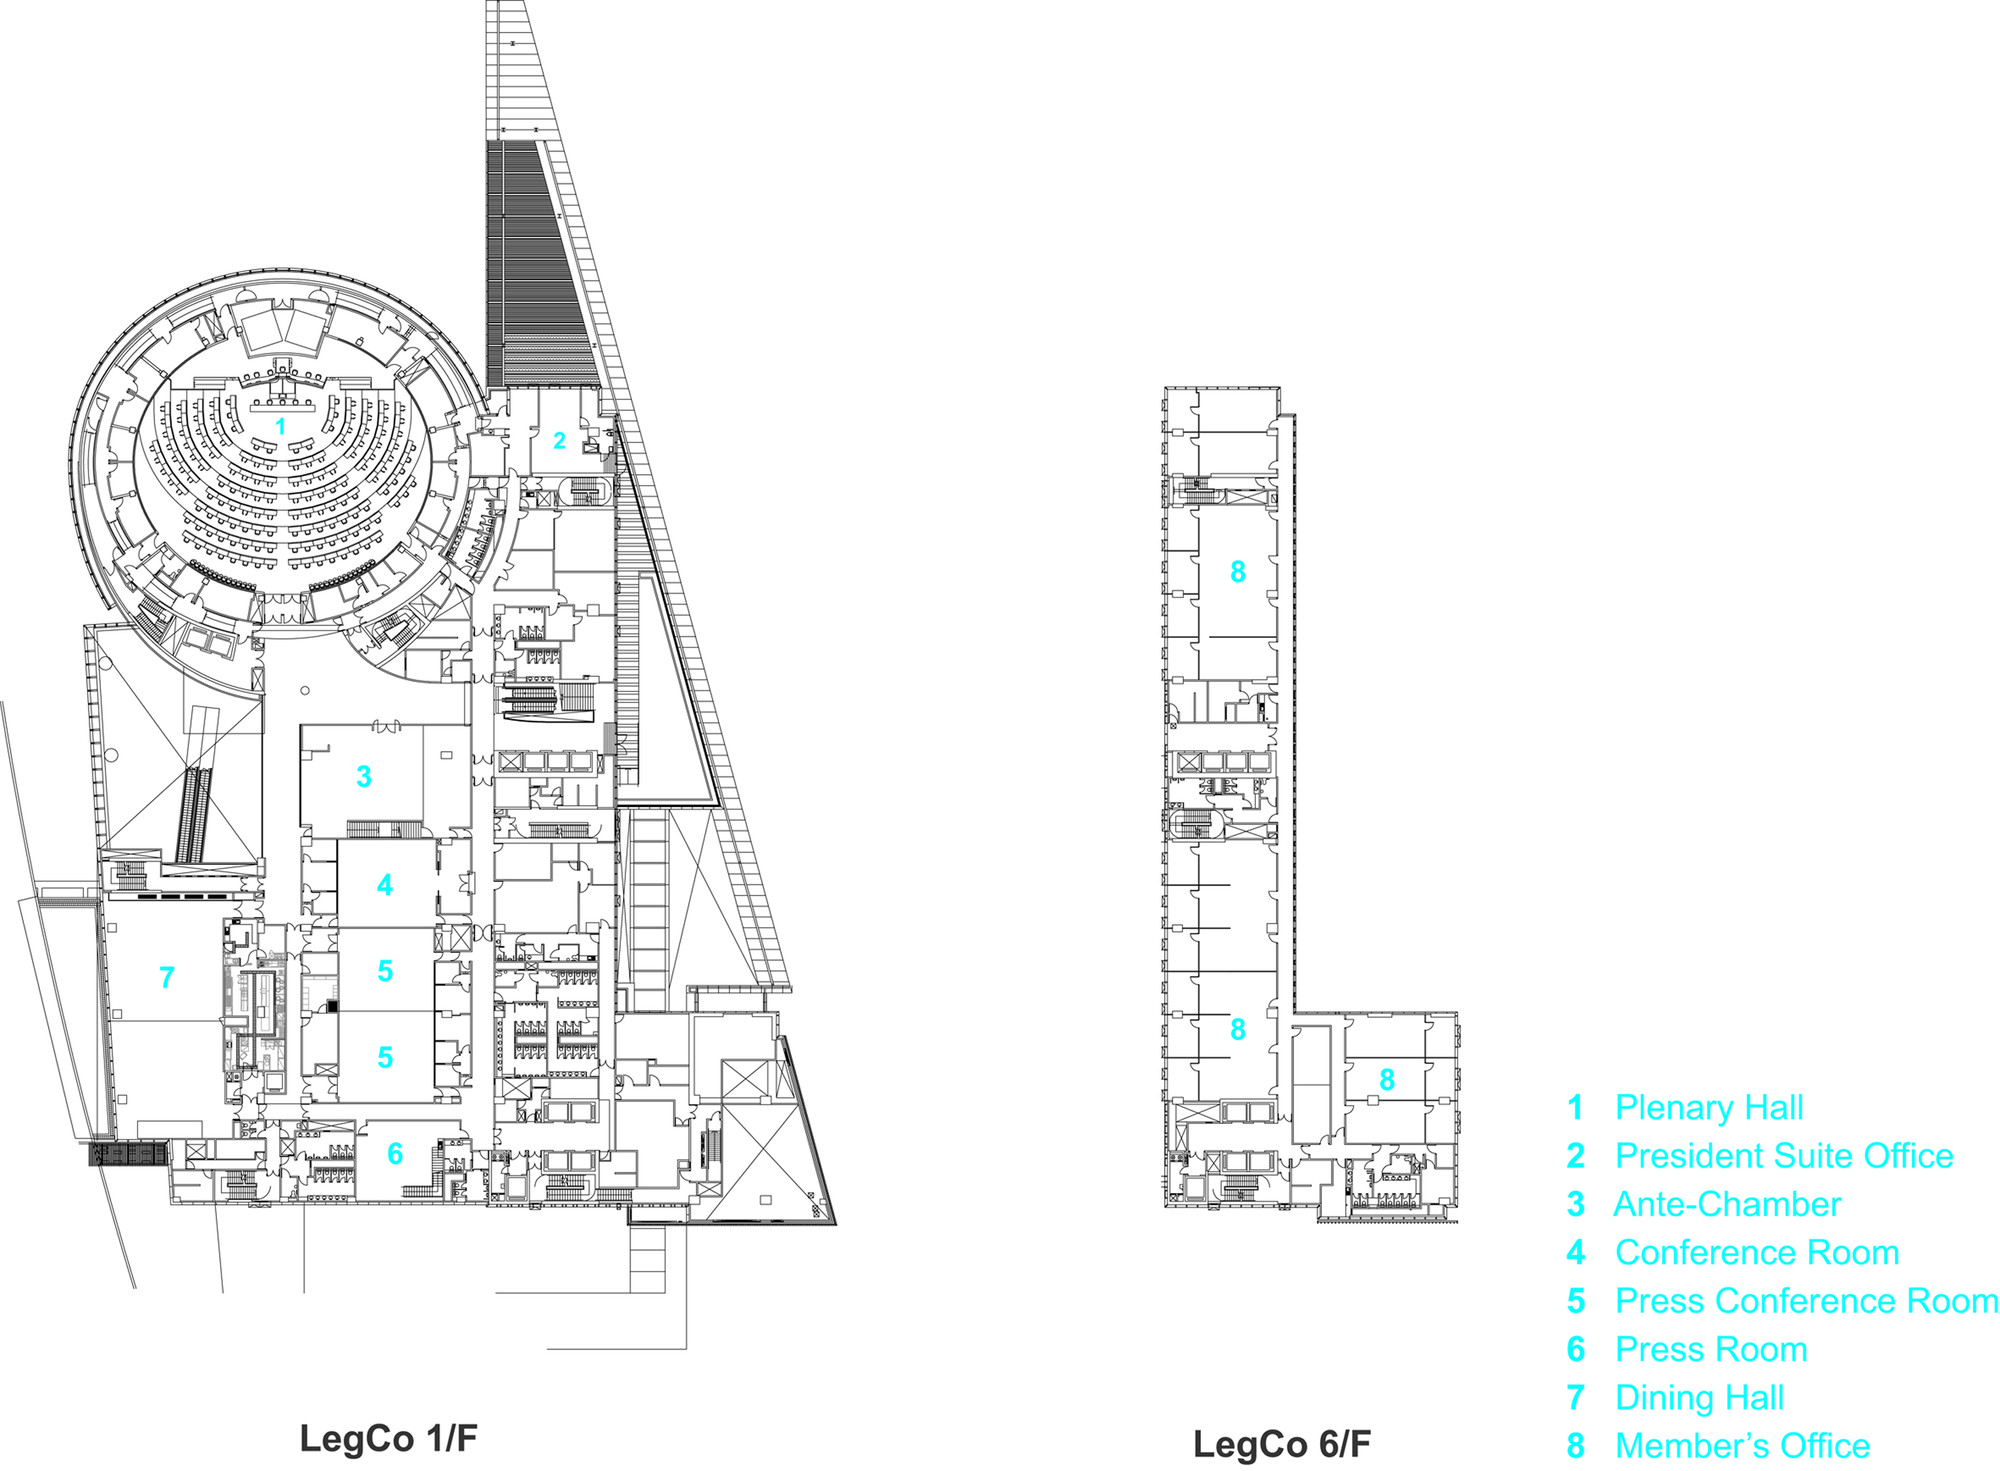 Triangular Floor Plan Gallery Of Hksar Government Headquarters Rocco Design